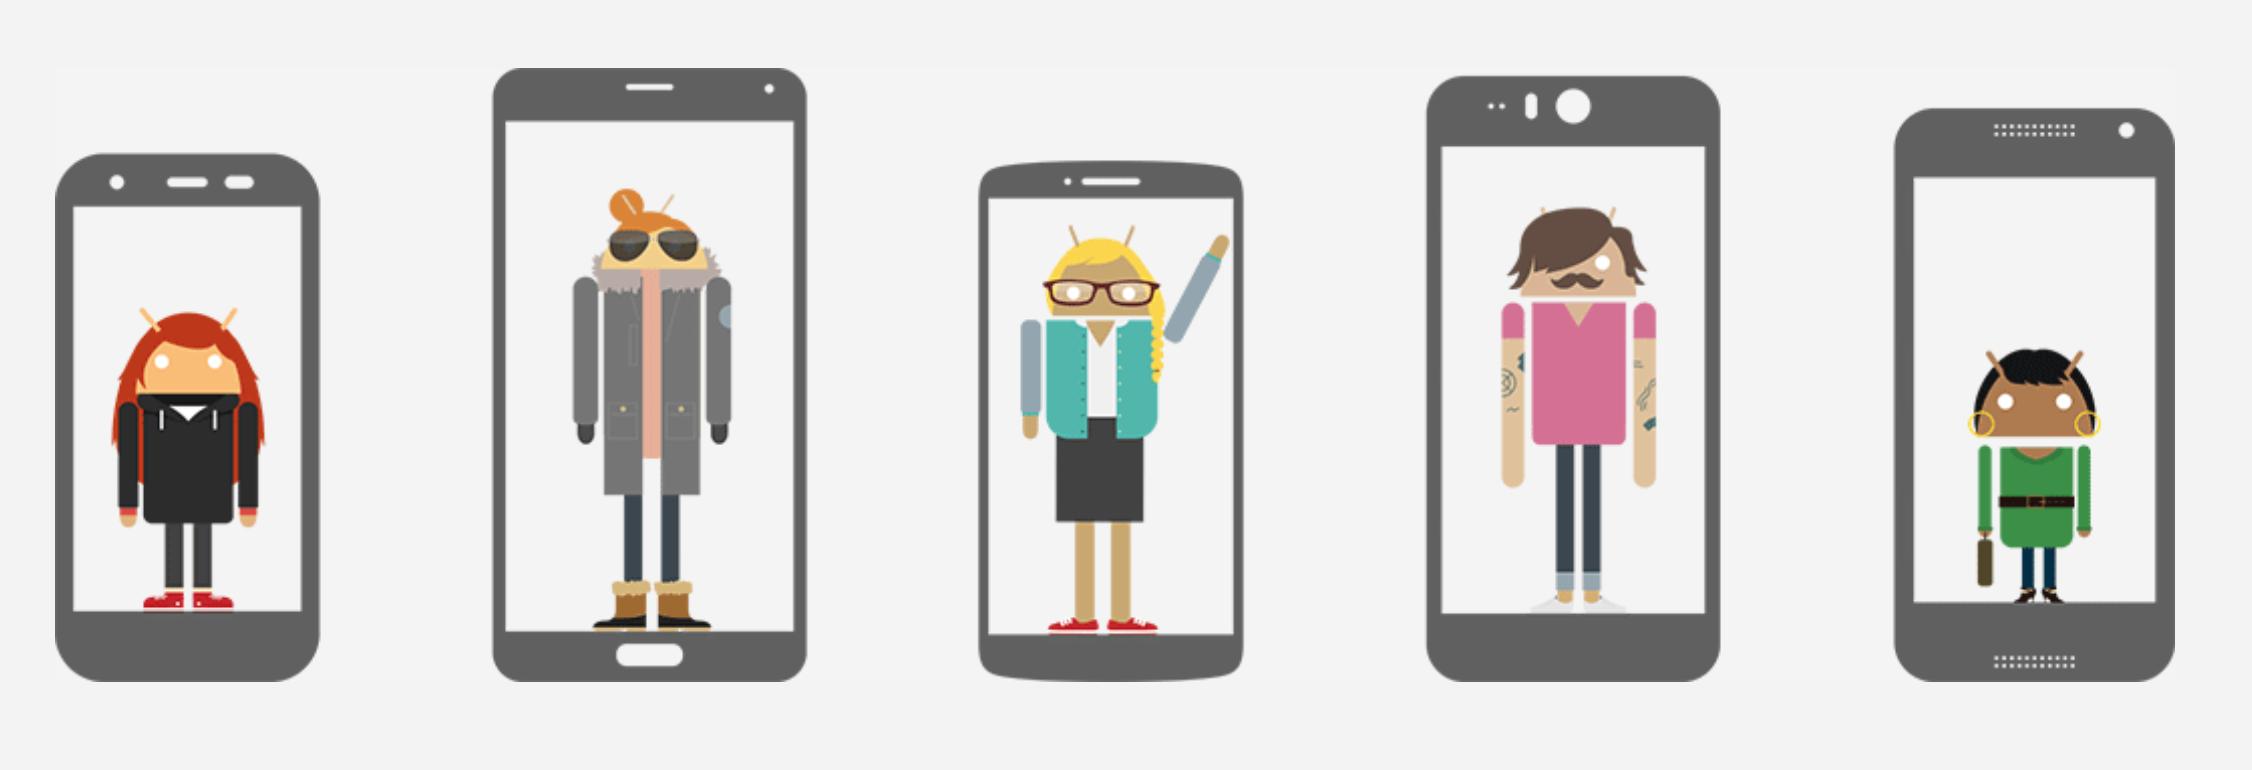 Phone Choosing An Android Phone 5 reasons to still choose an android phone over iphone tech screen shot 2015 10 12 at 06 53 am png